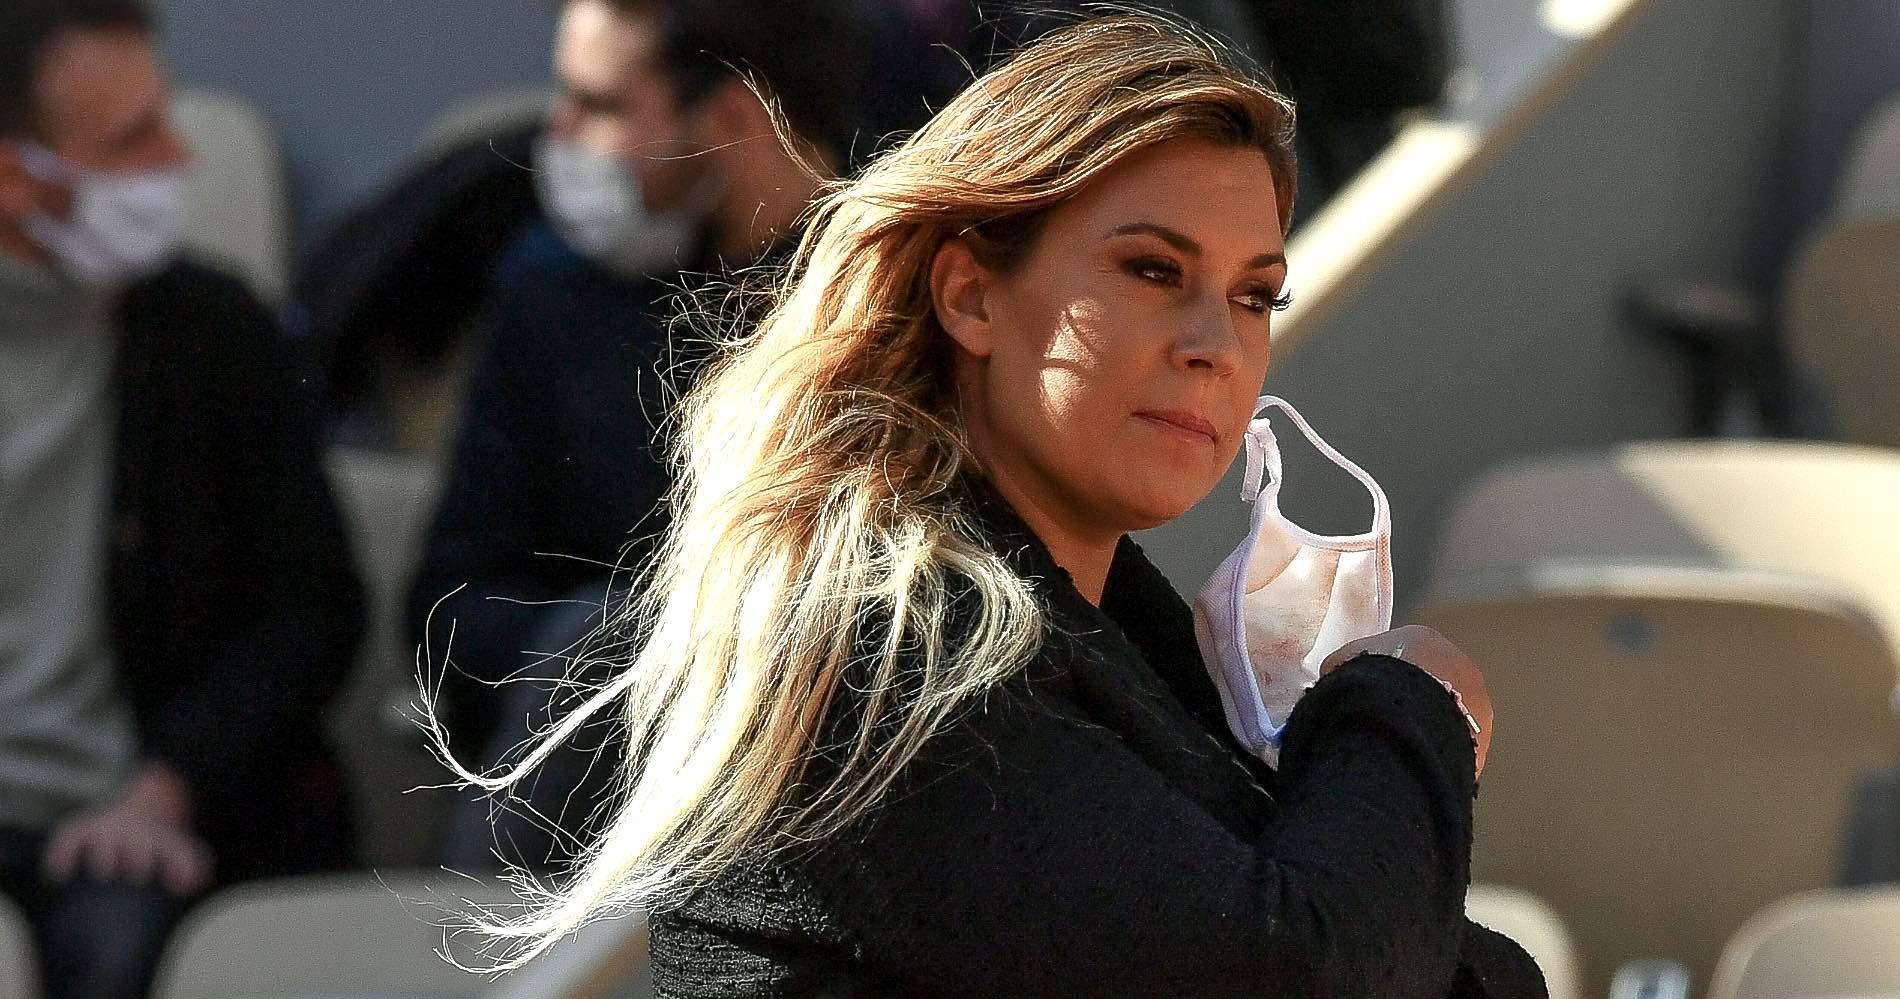 Marion Bartoli, 2020